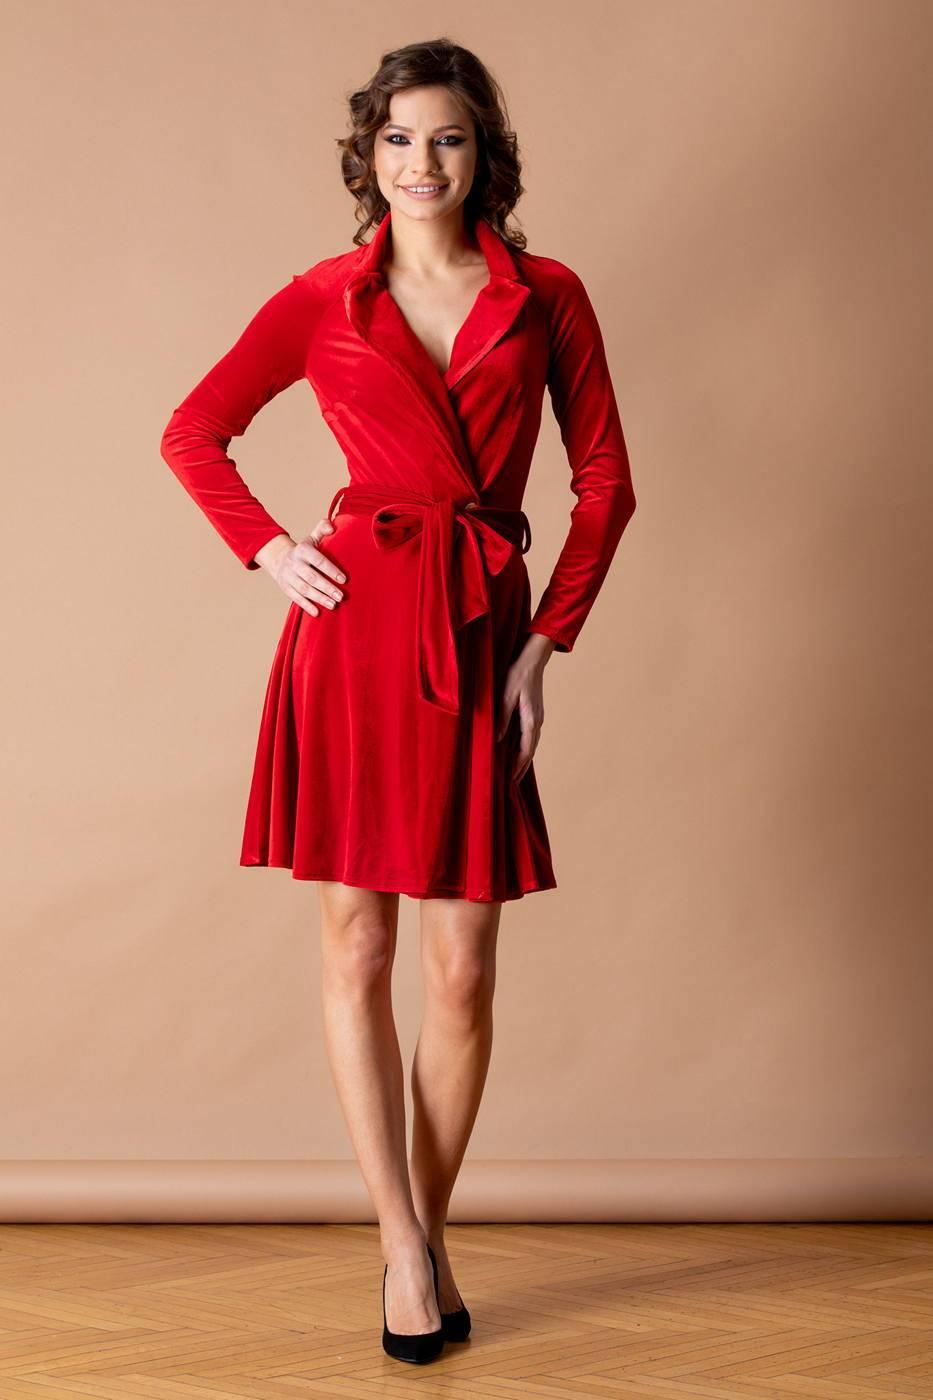 Alessia Κόκκινο Φόρεμα 4531